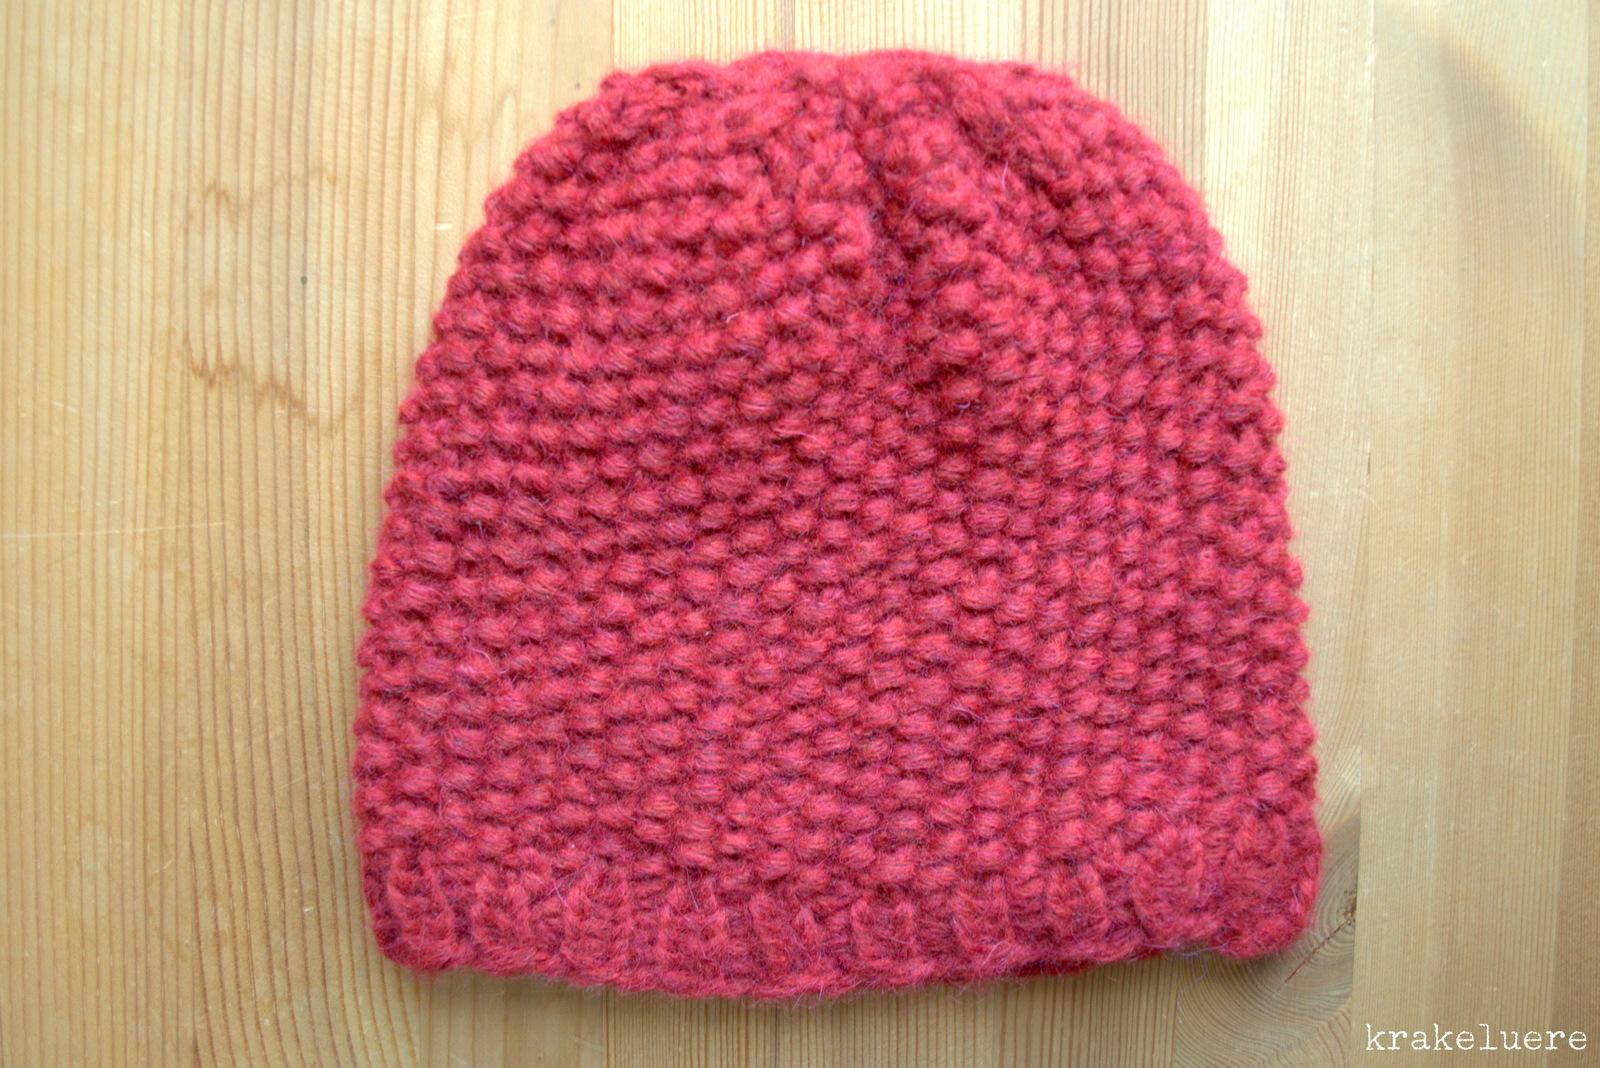 krakeluere.de - kuschlig-warme Mütze im Perlmuster